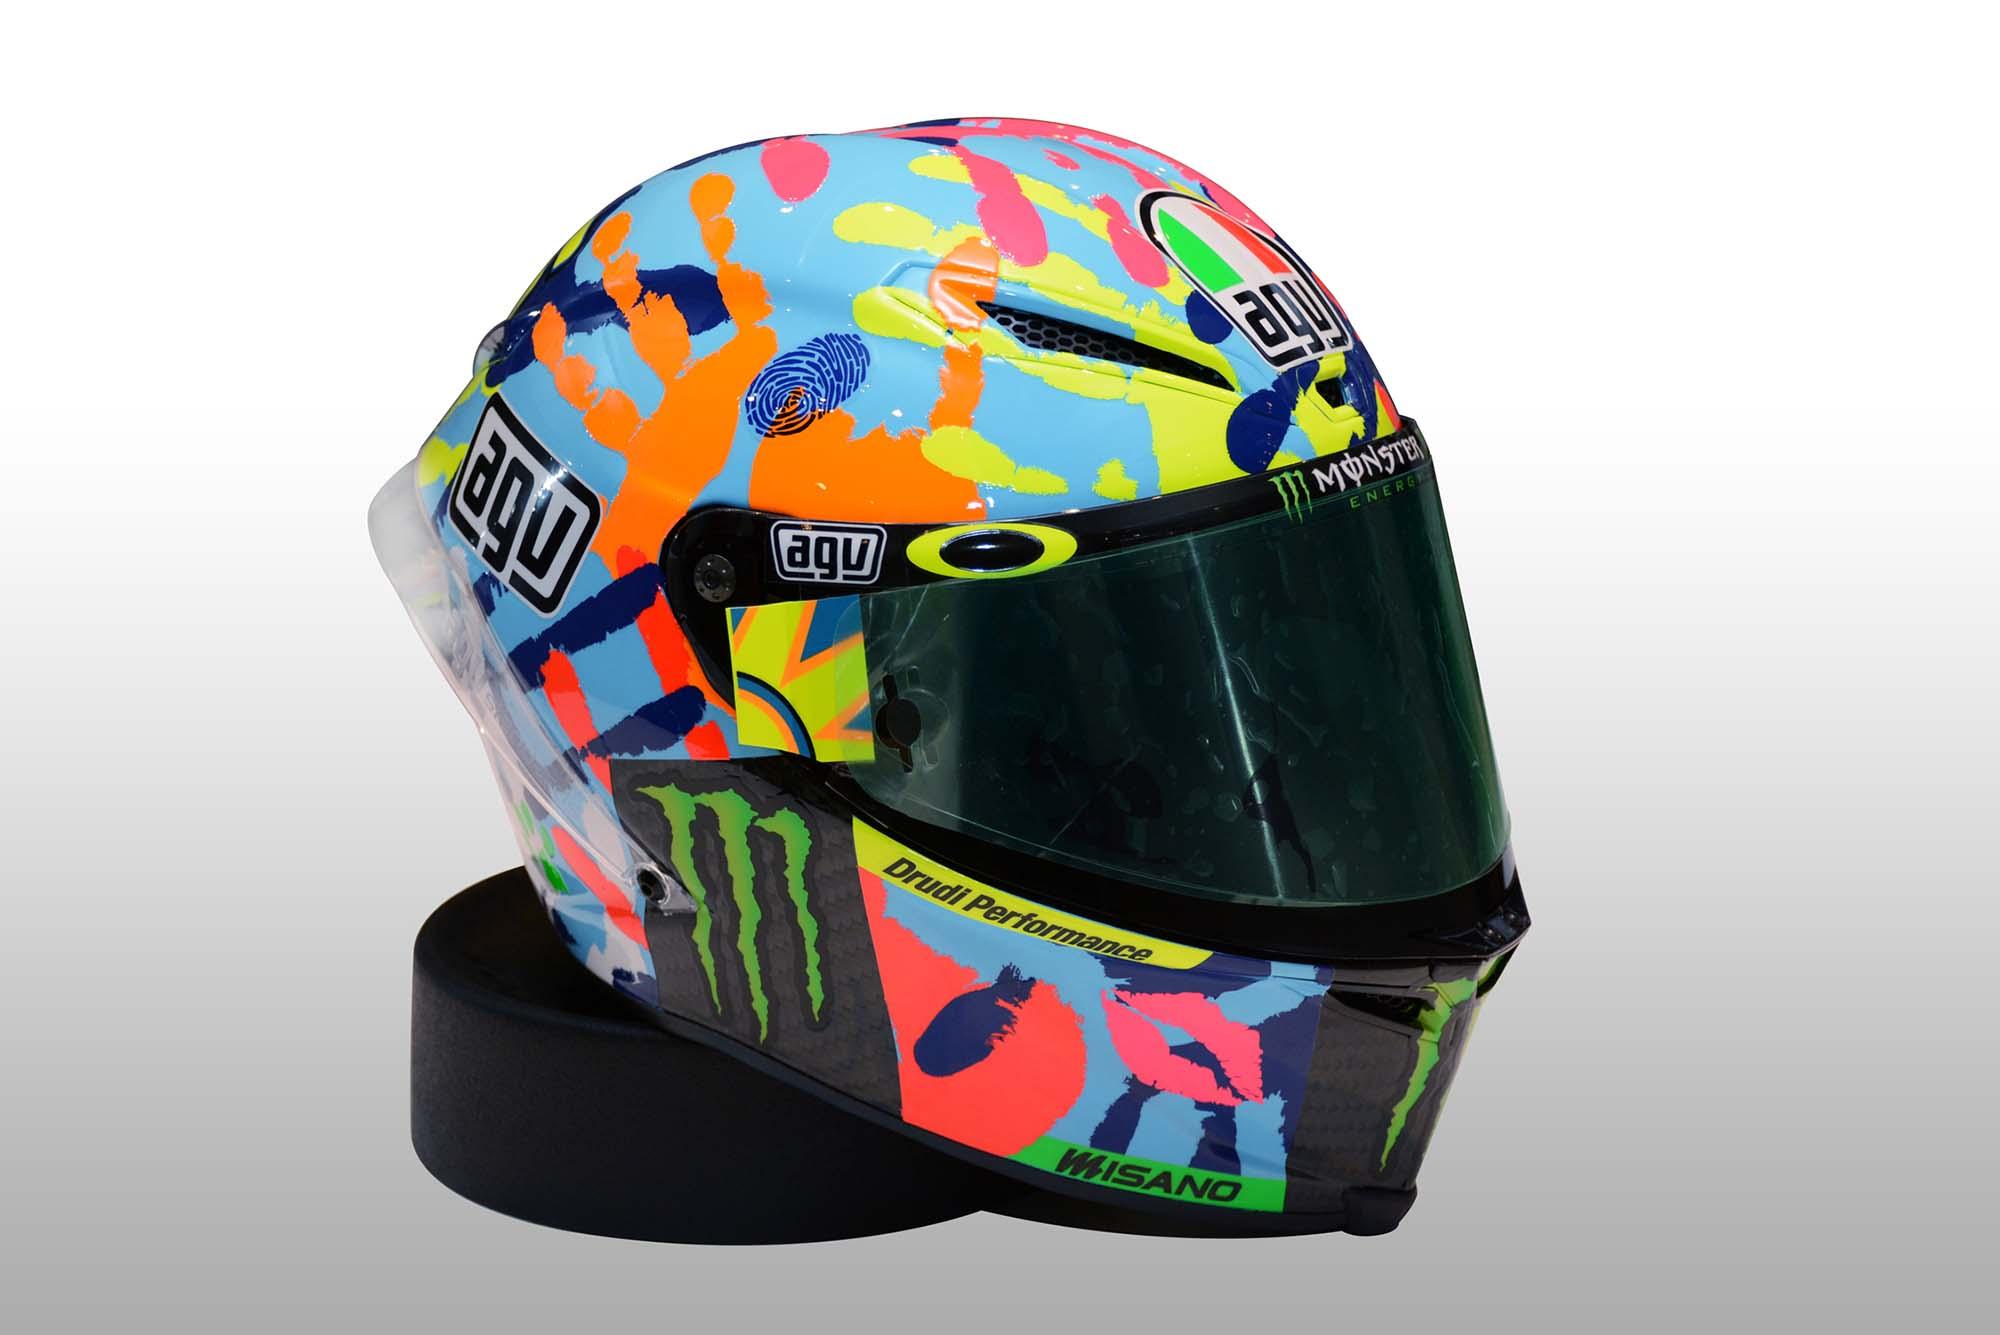 Photos Valentino Rossi S Special Misano Helmet 2014